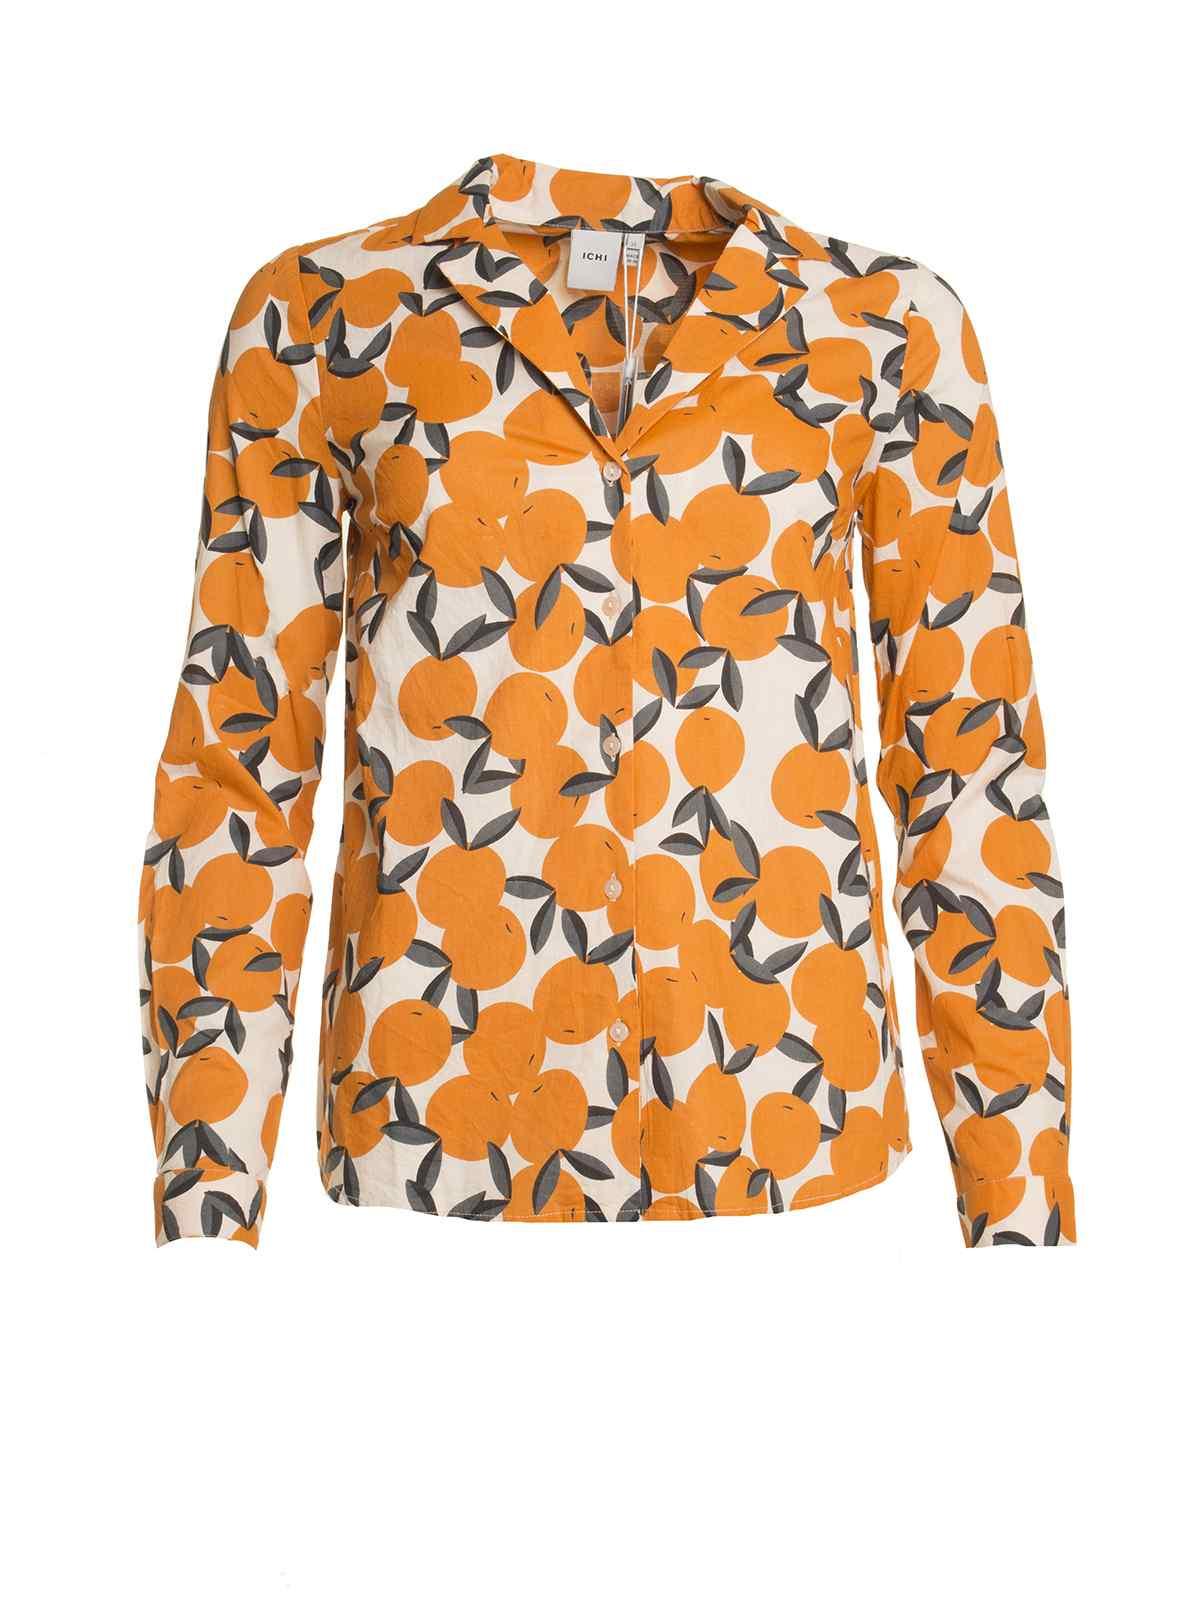 7451a978926df3 Valborg Shirt - Katie Kerr - Women's Clothing - UK